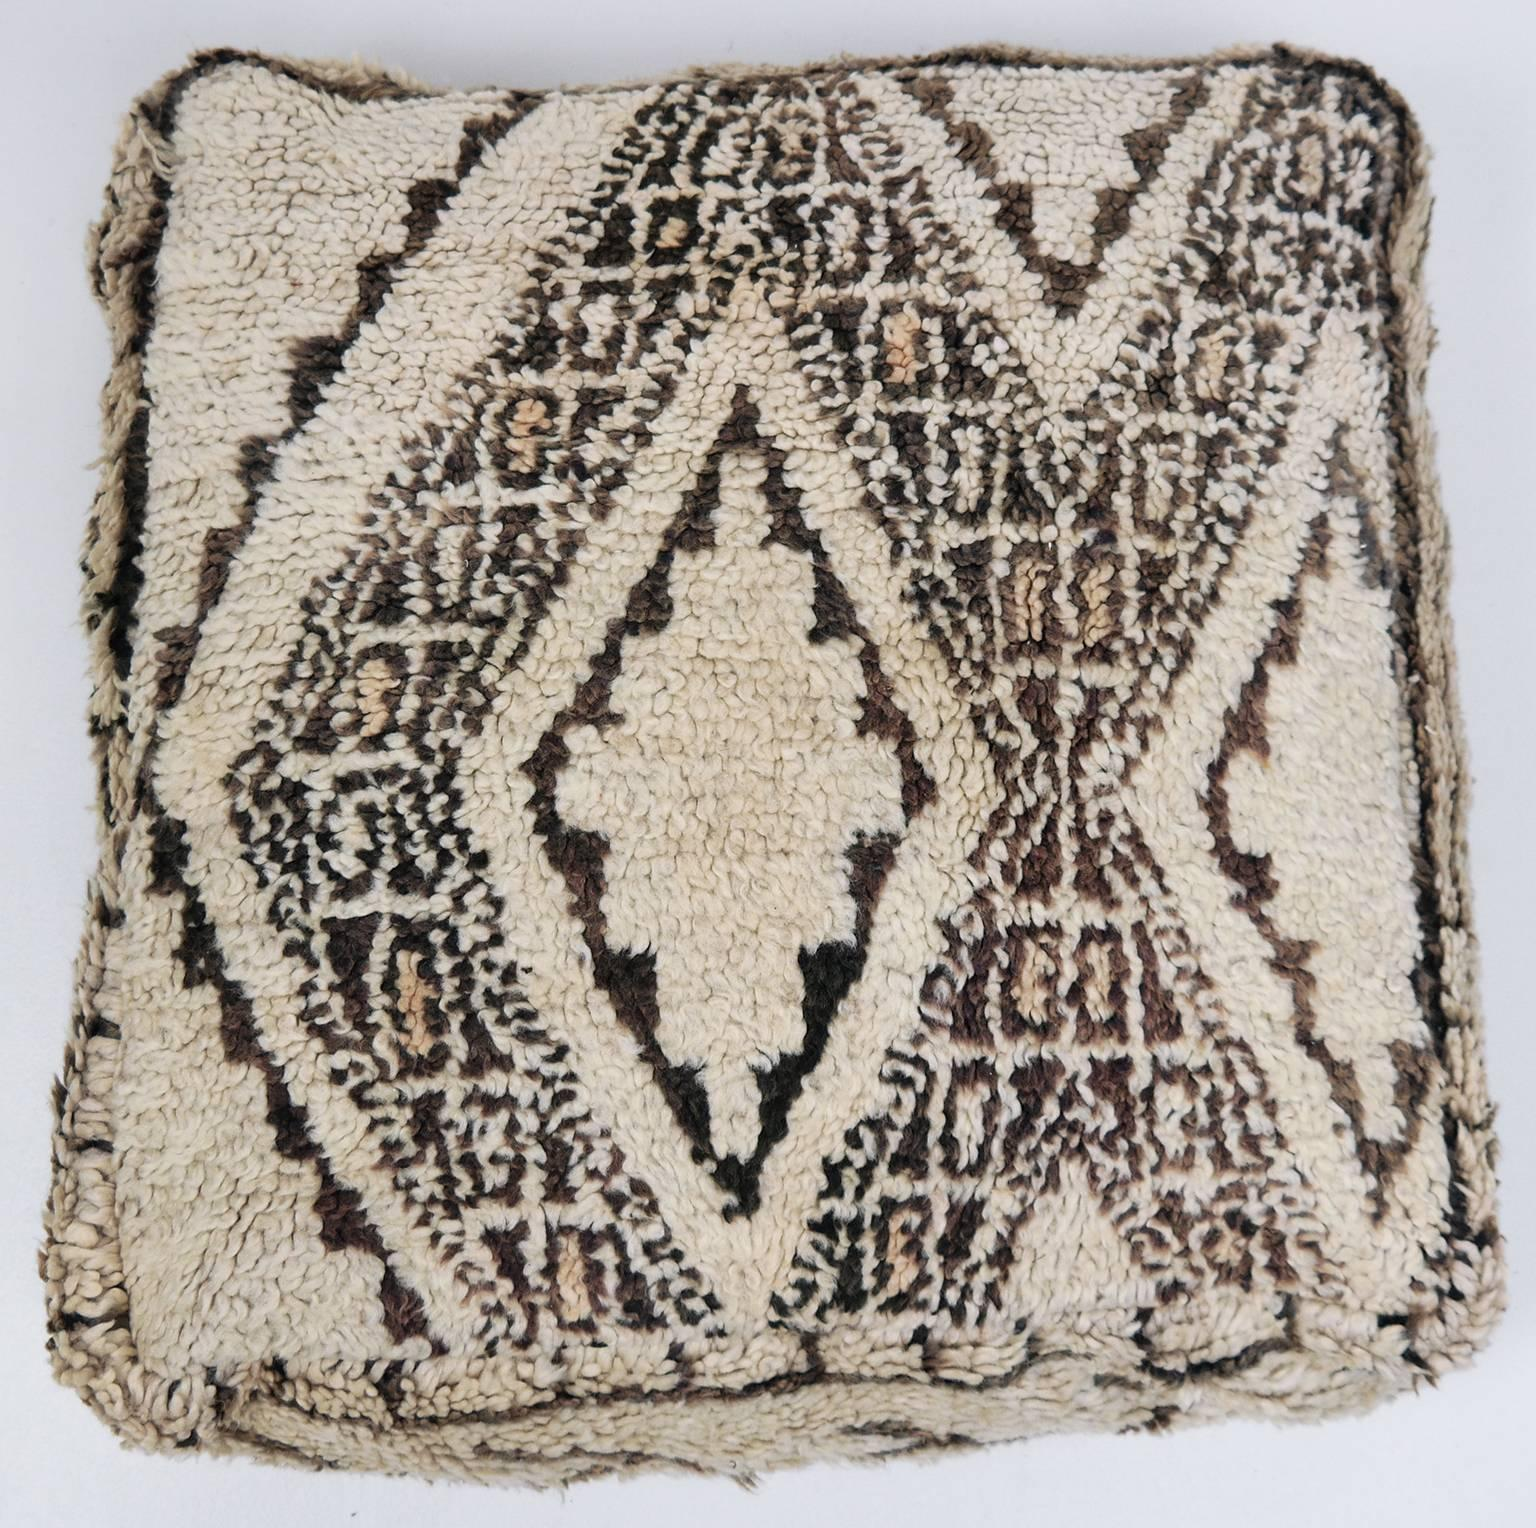 Moroccan Pouf Beni Ourain Floor Cushion Morocco Ottoman For Sale